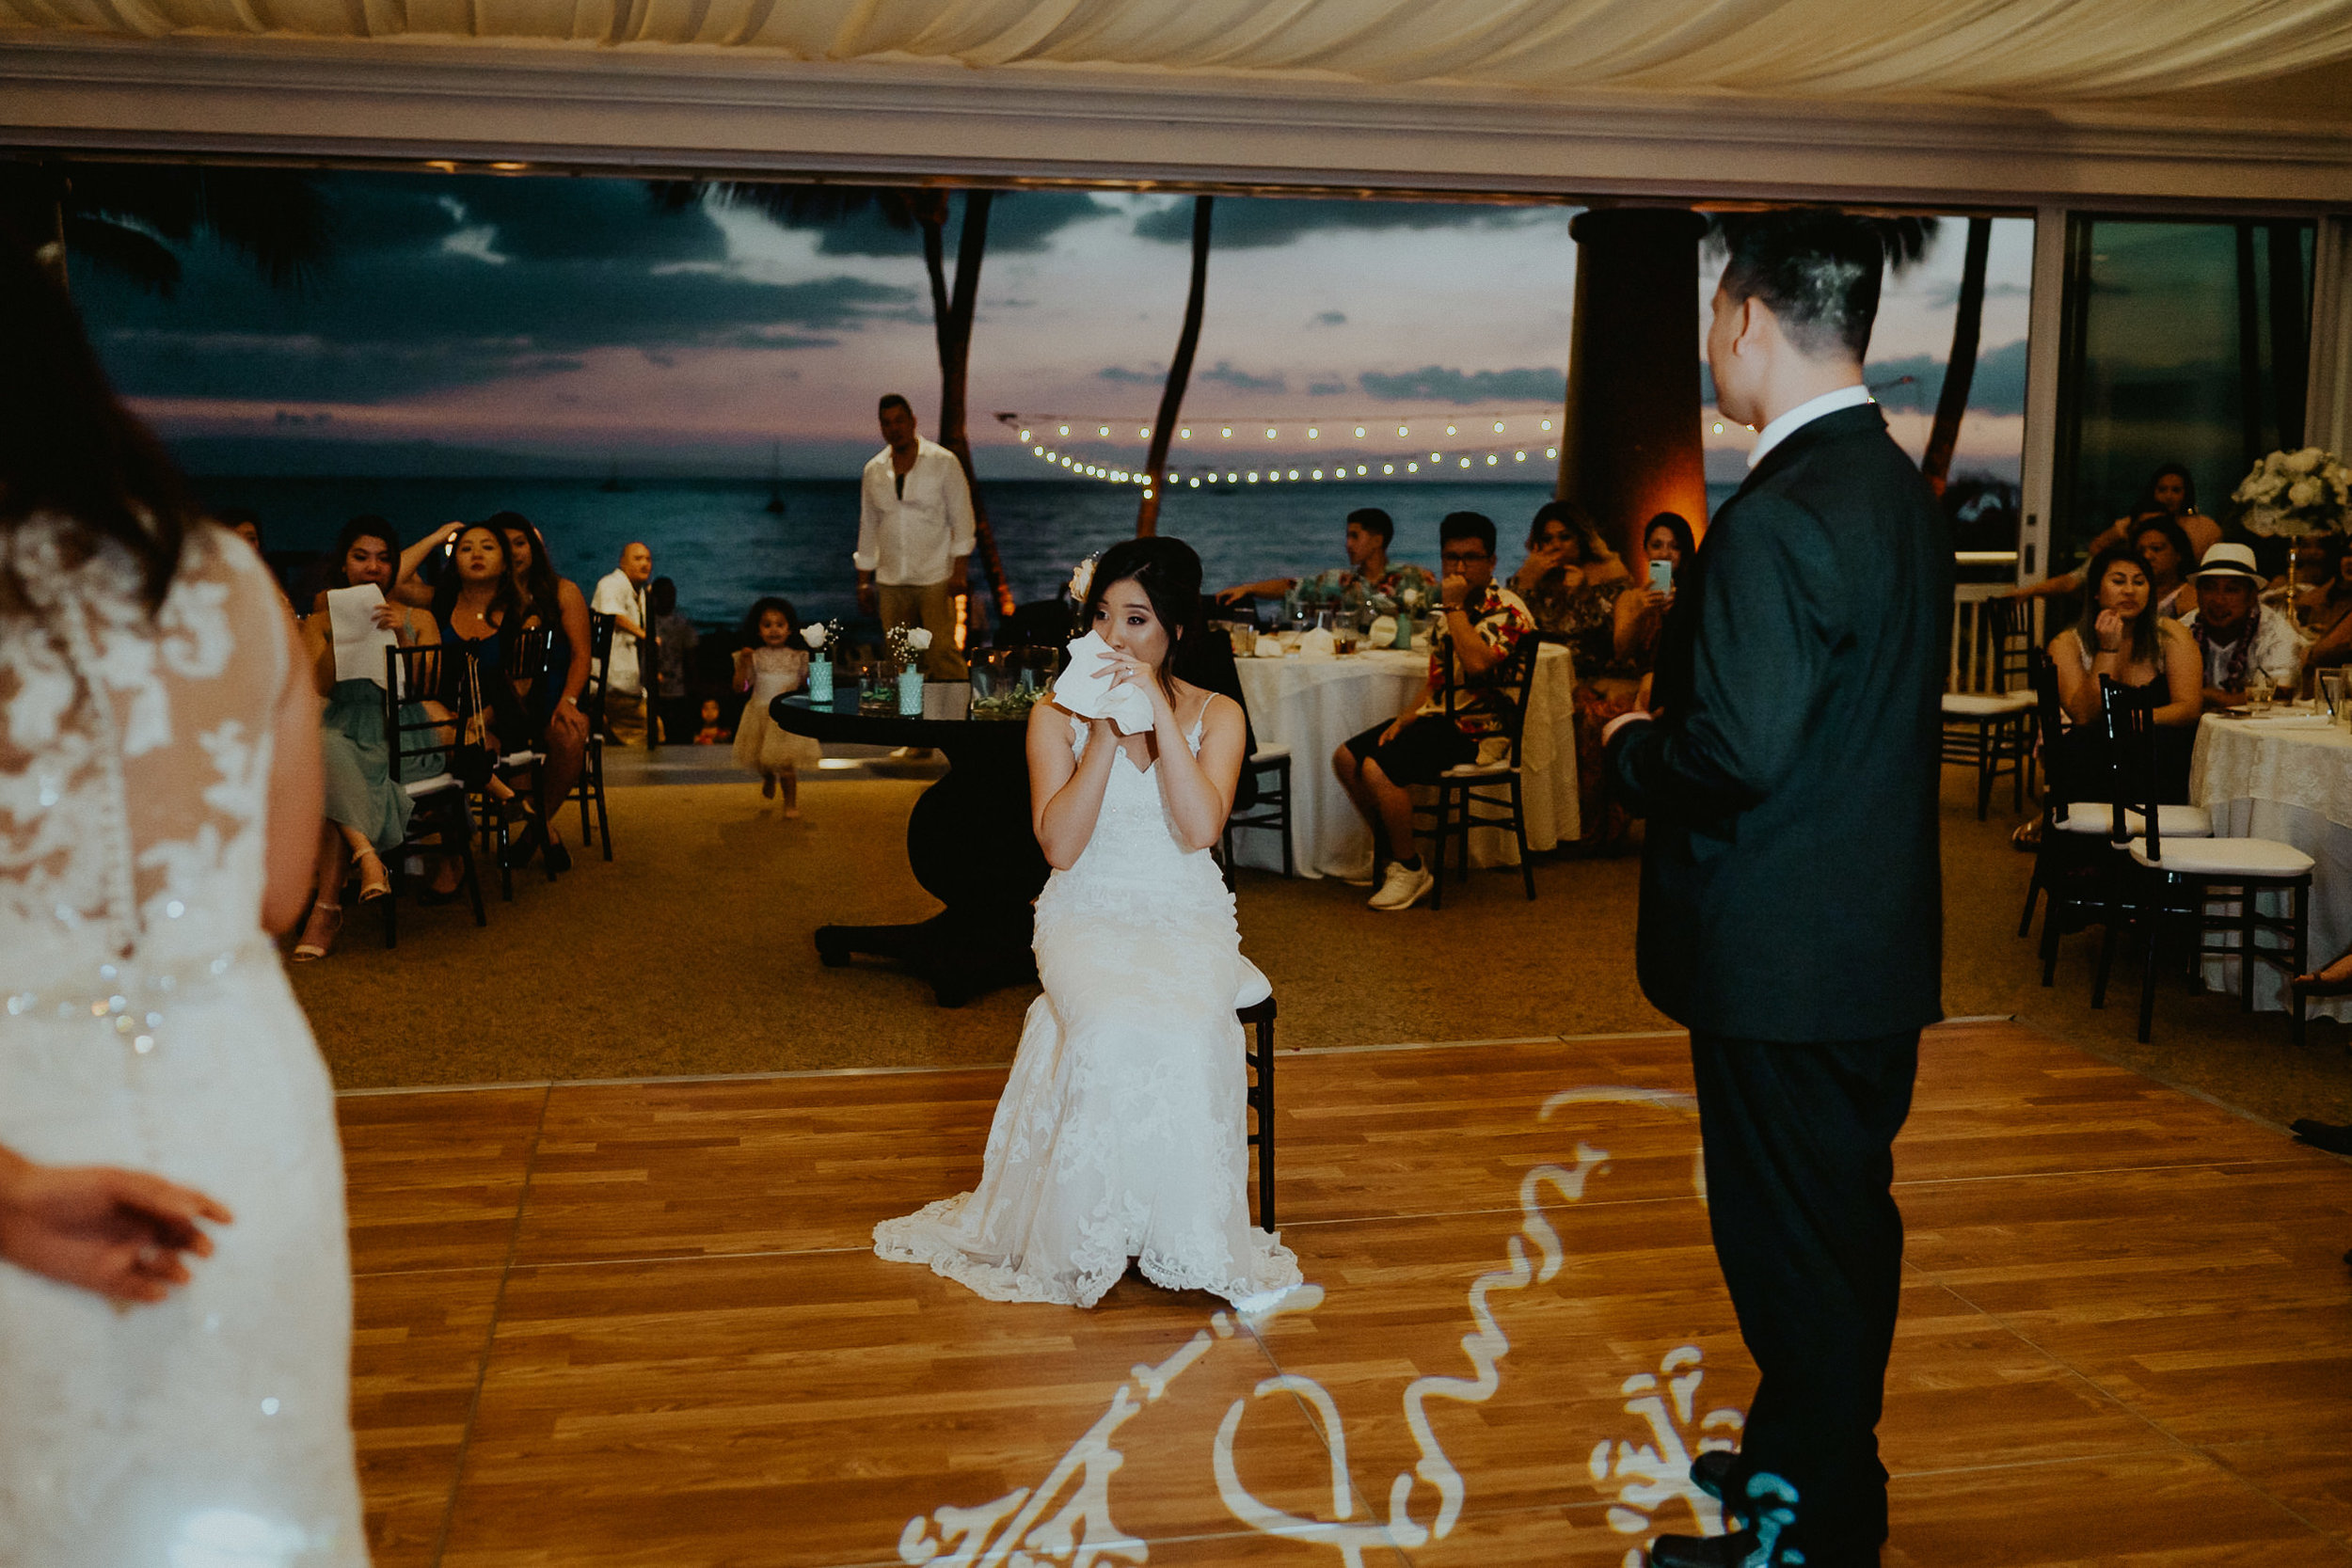 Maui_Destination_wedding_Alfred_Tang-71.jpg